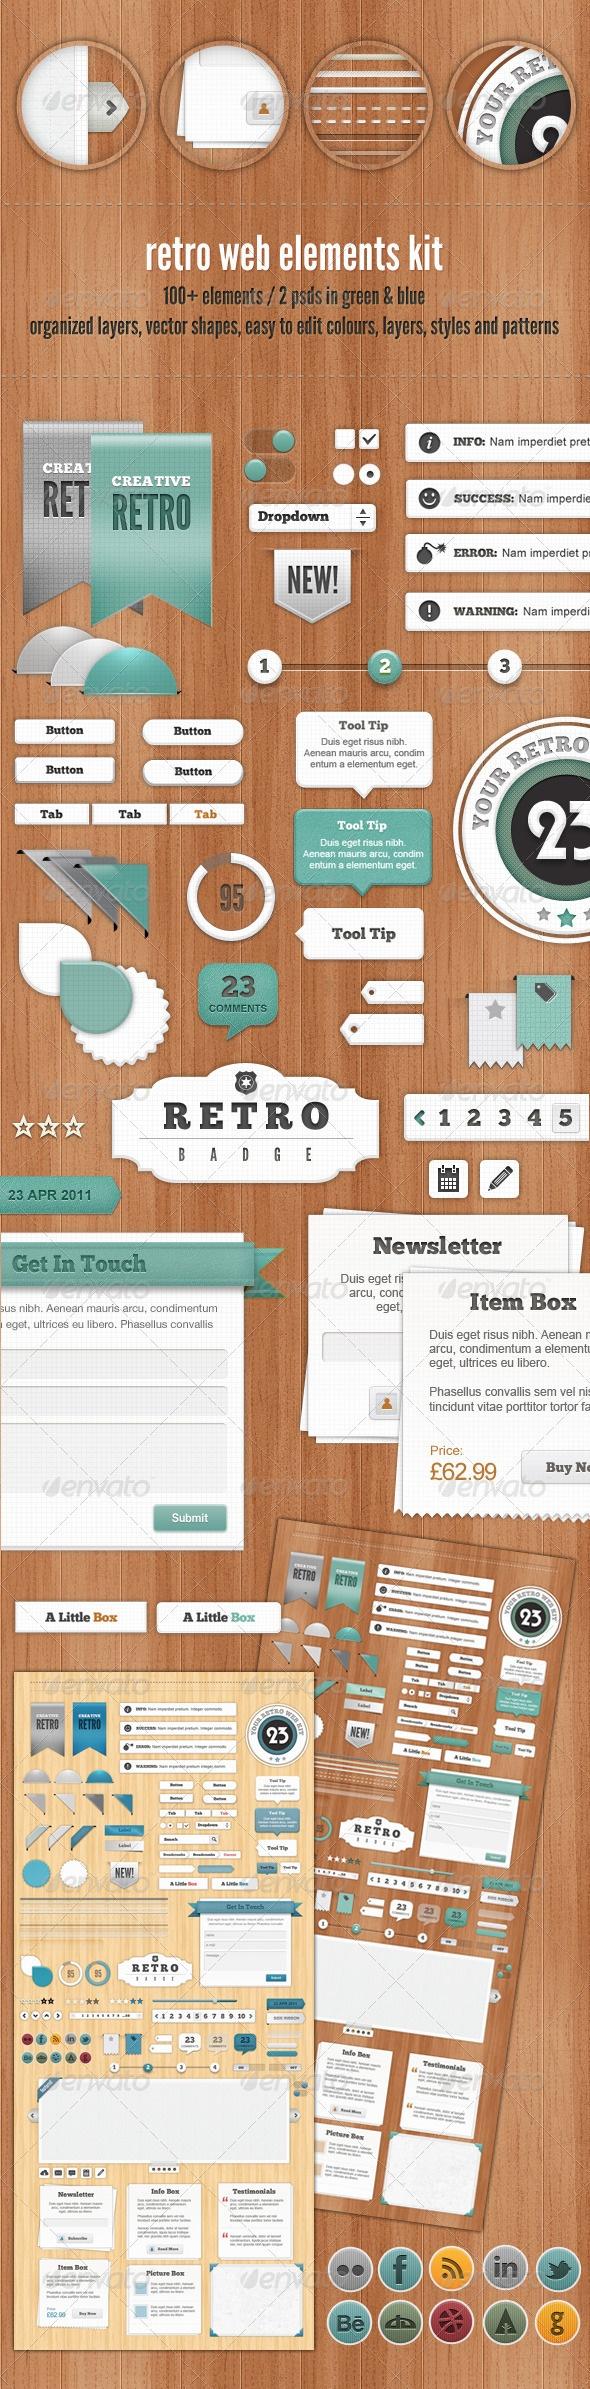 30 best Retro design element images on Pinterest   Graphics ... Sample Da Form Best Warrior Compeion on